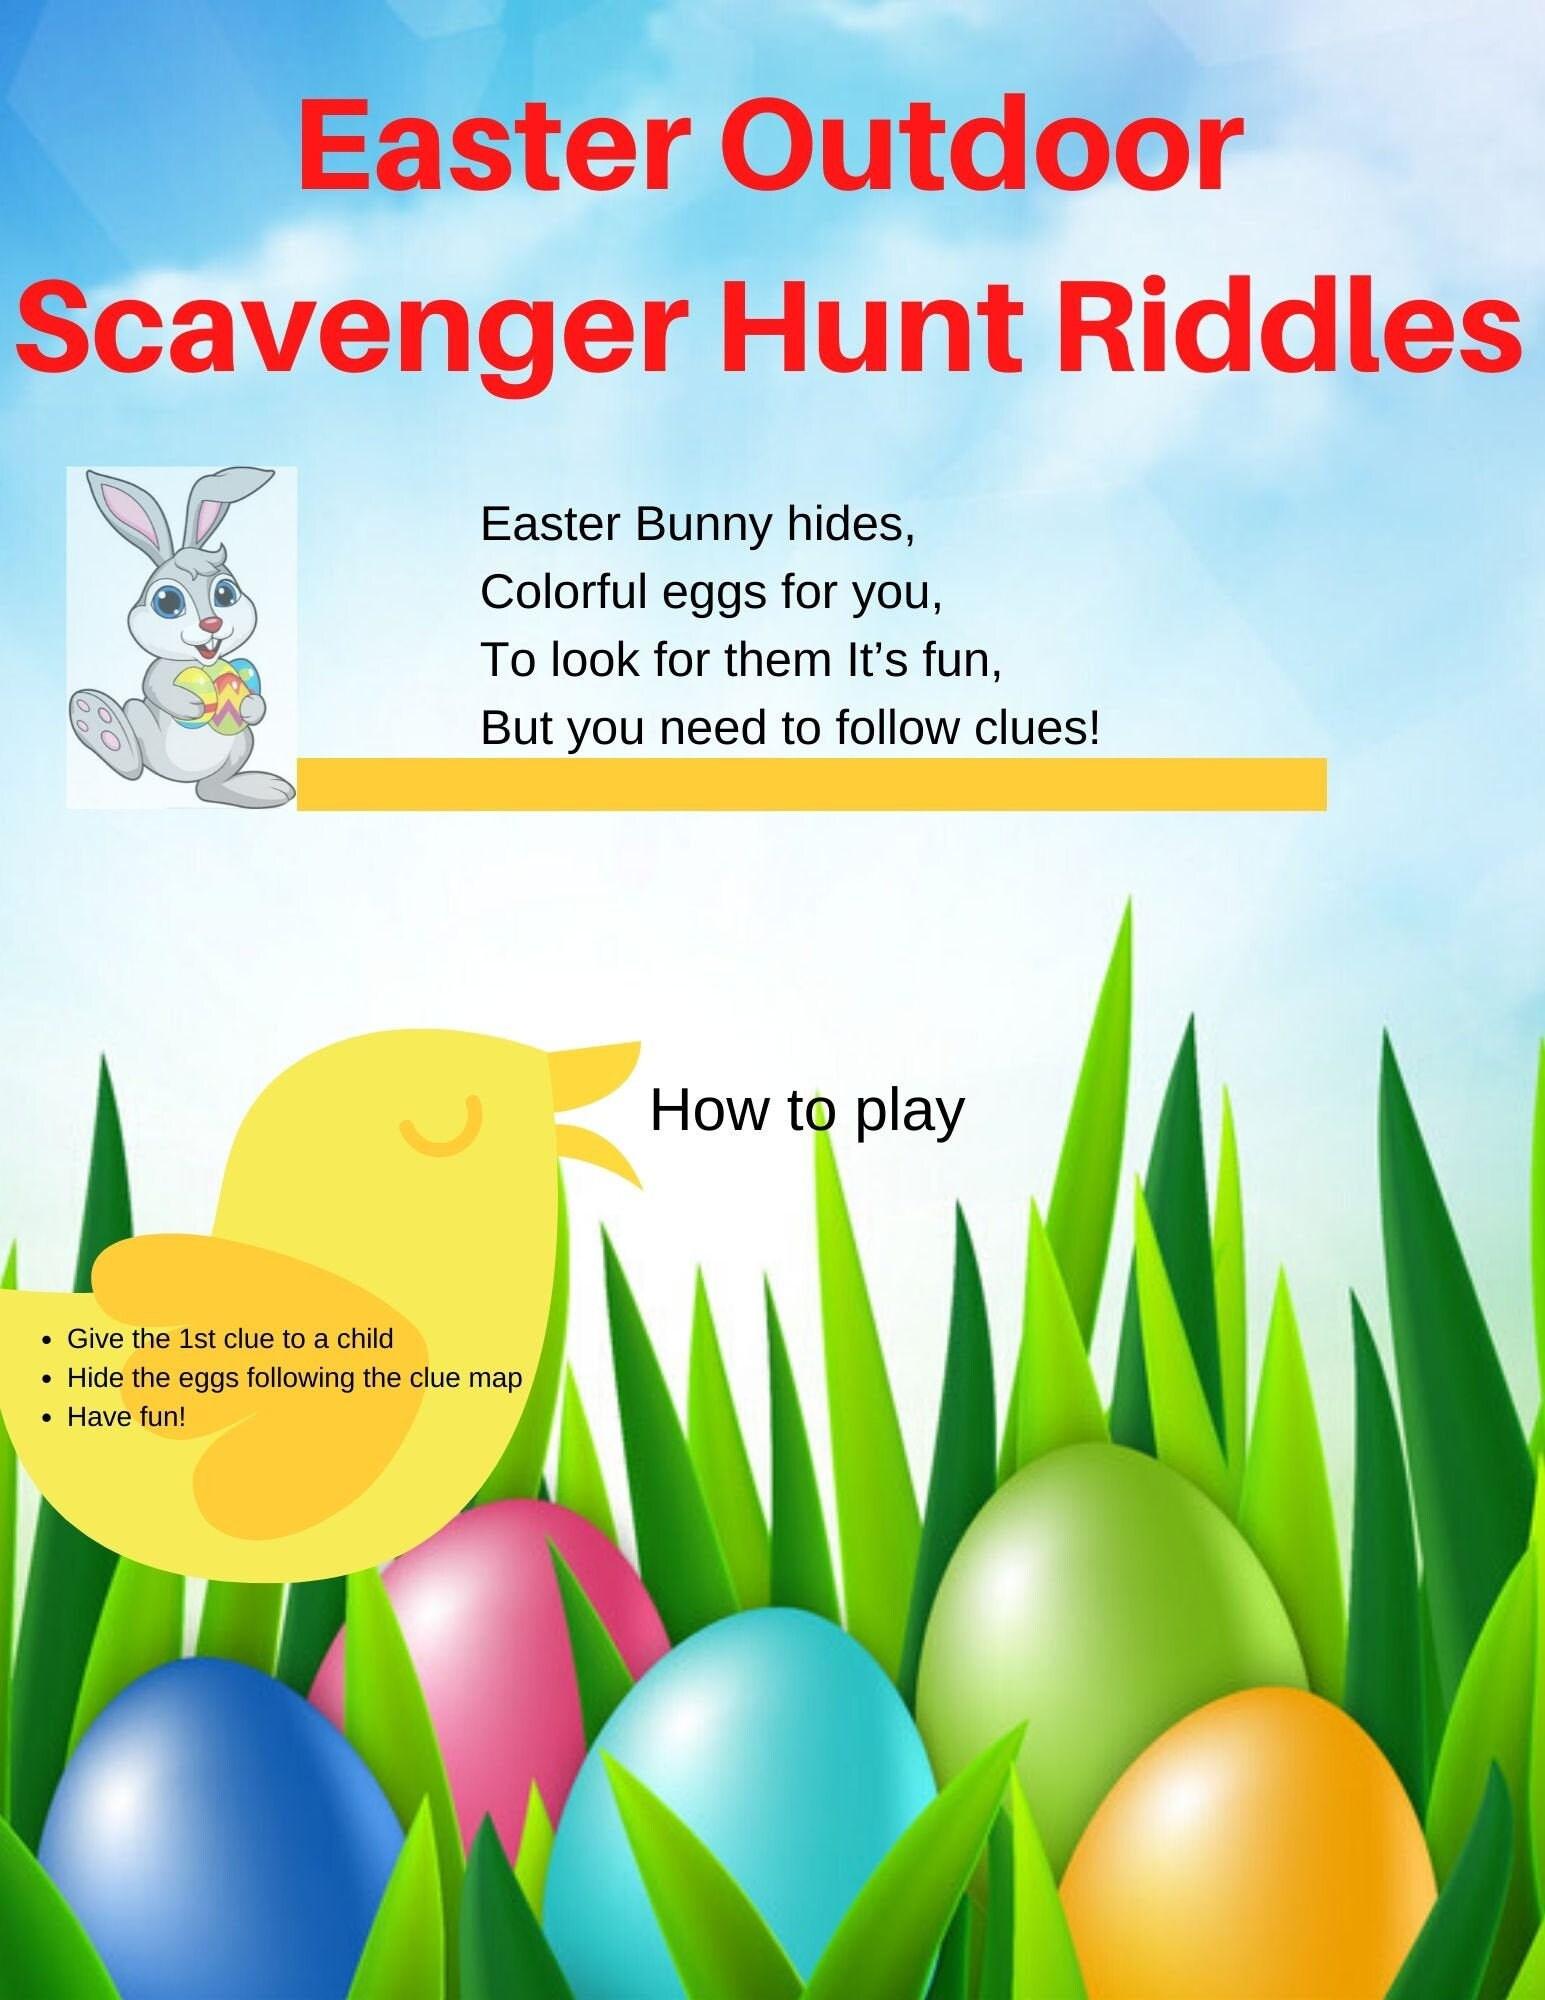 Easter Outdoor Scavenger Hunt Riddles 12 Rhyming Clues